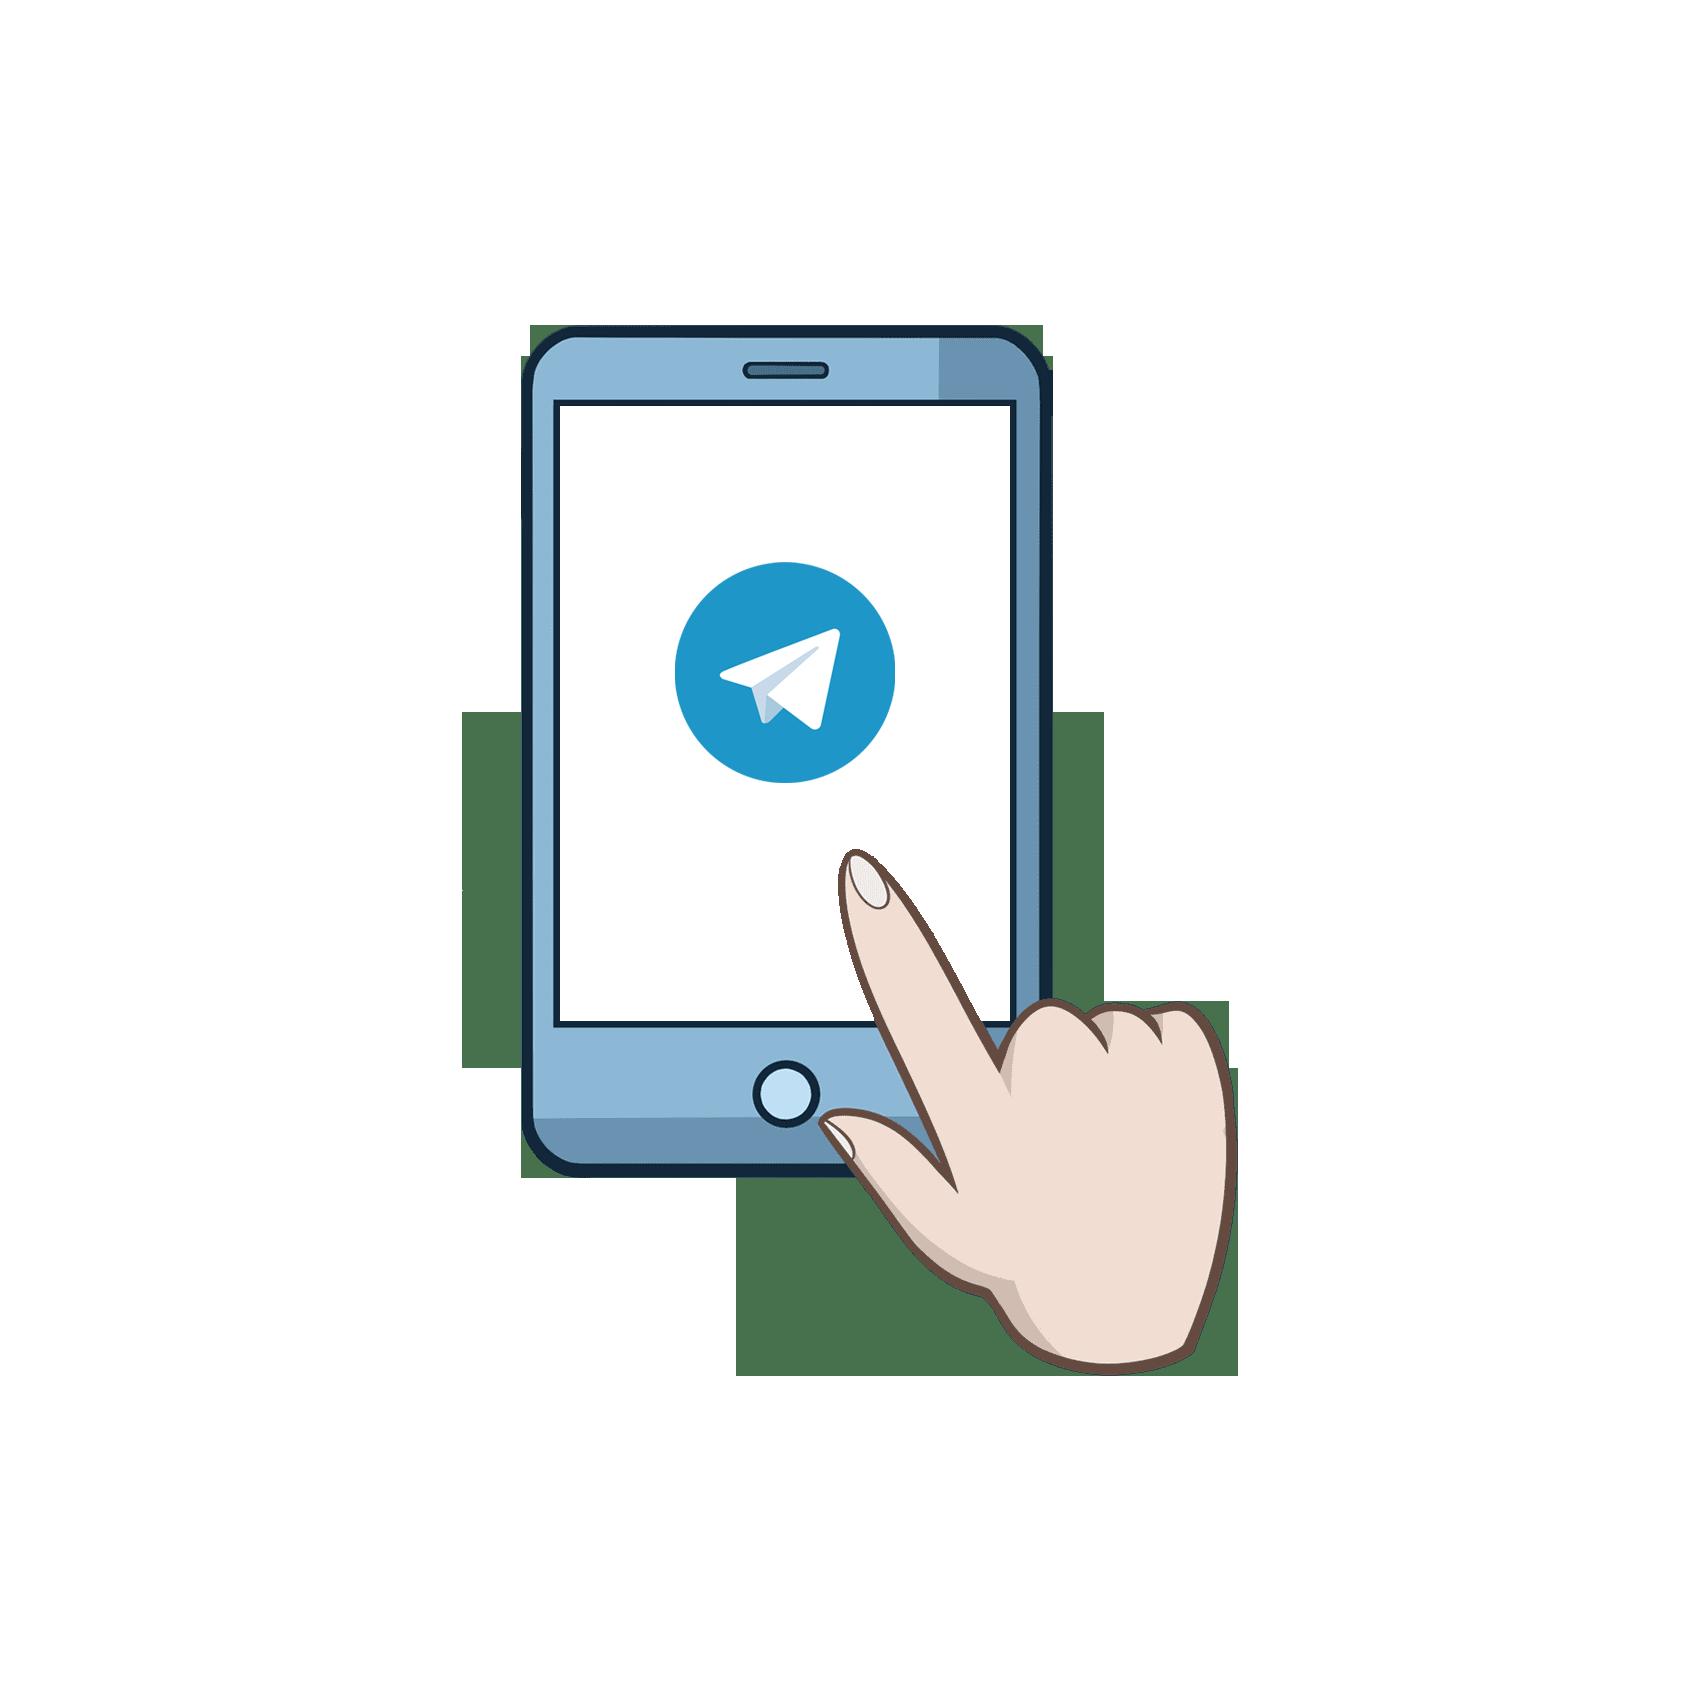 оплата в Telegram